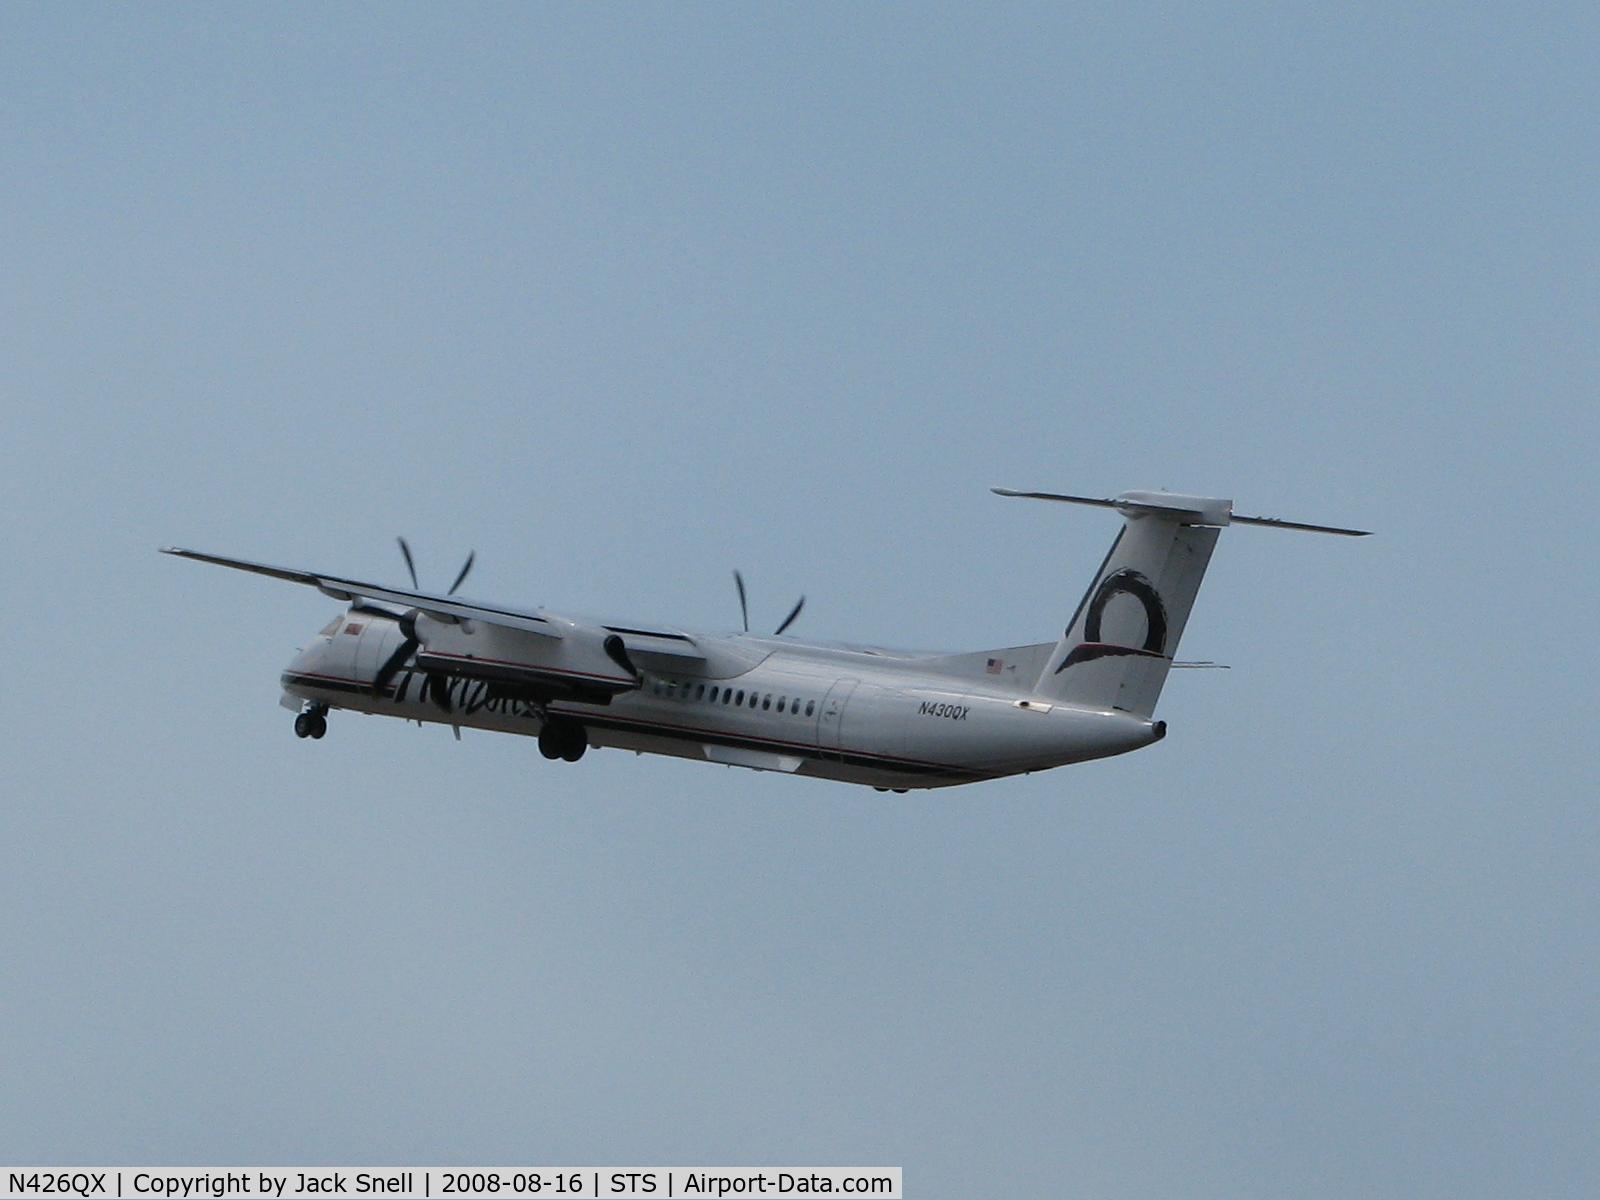 N426QX, 2007 Bombardier DHC-8-402 Dash 8 C/N 4154, Horizon Air Departing